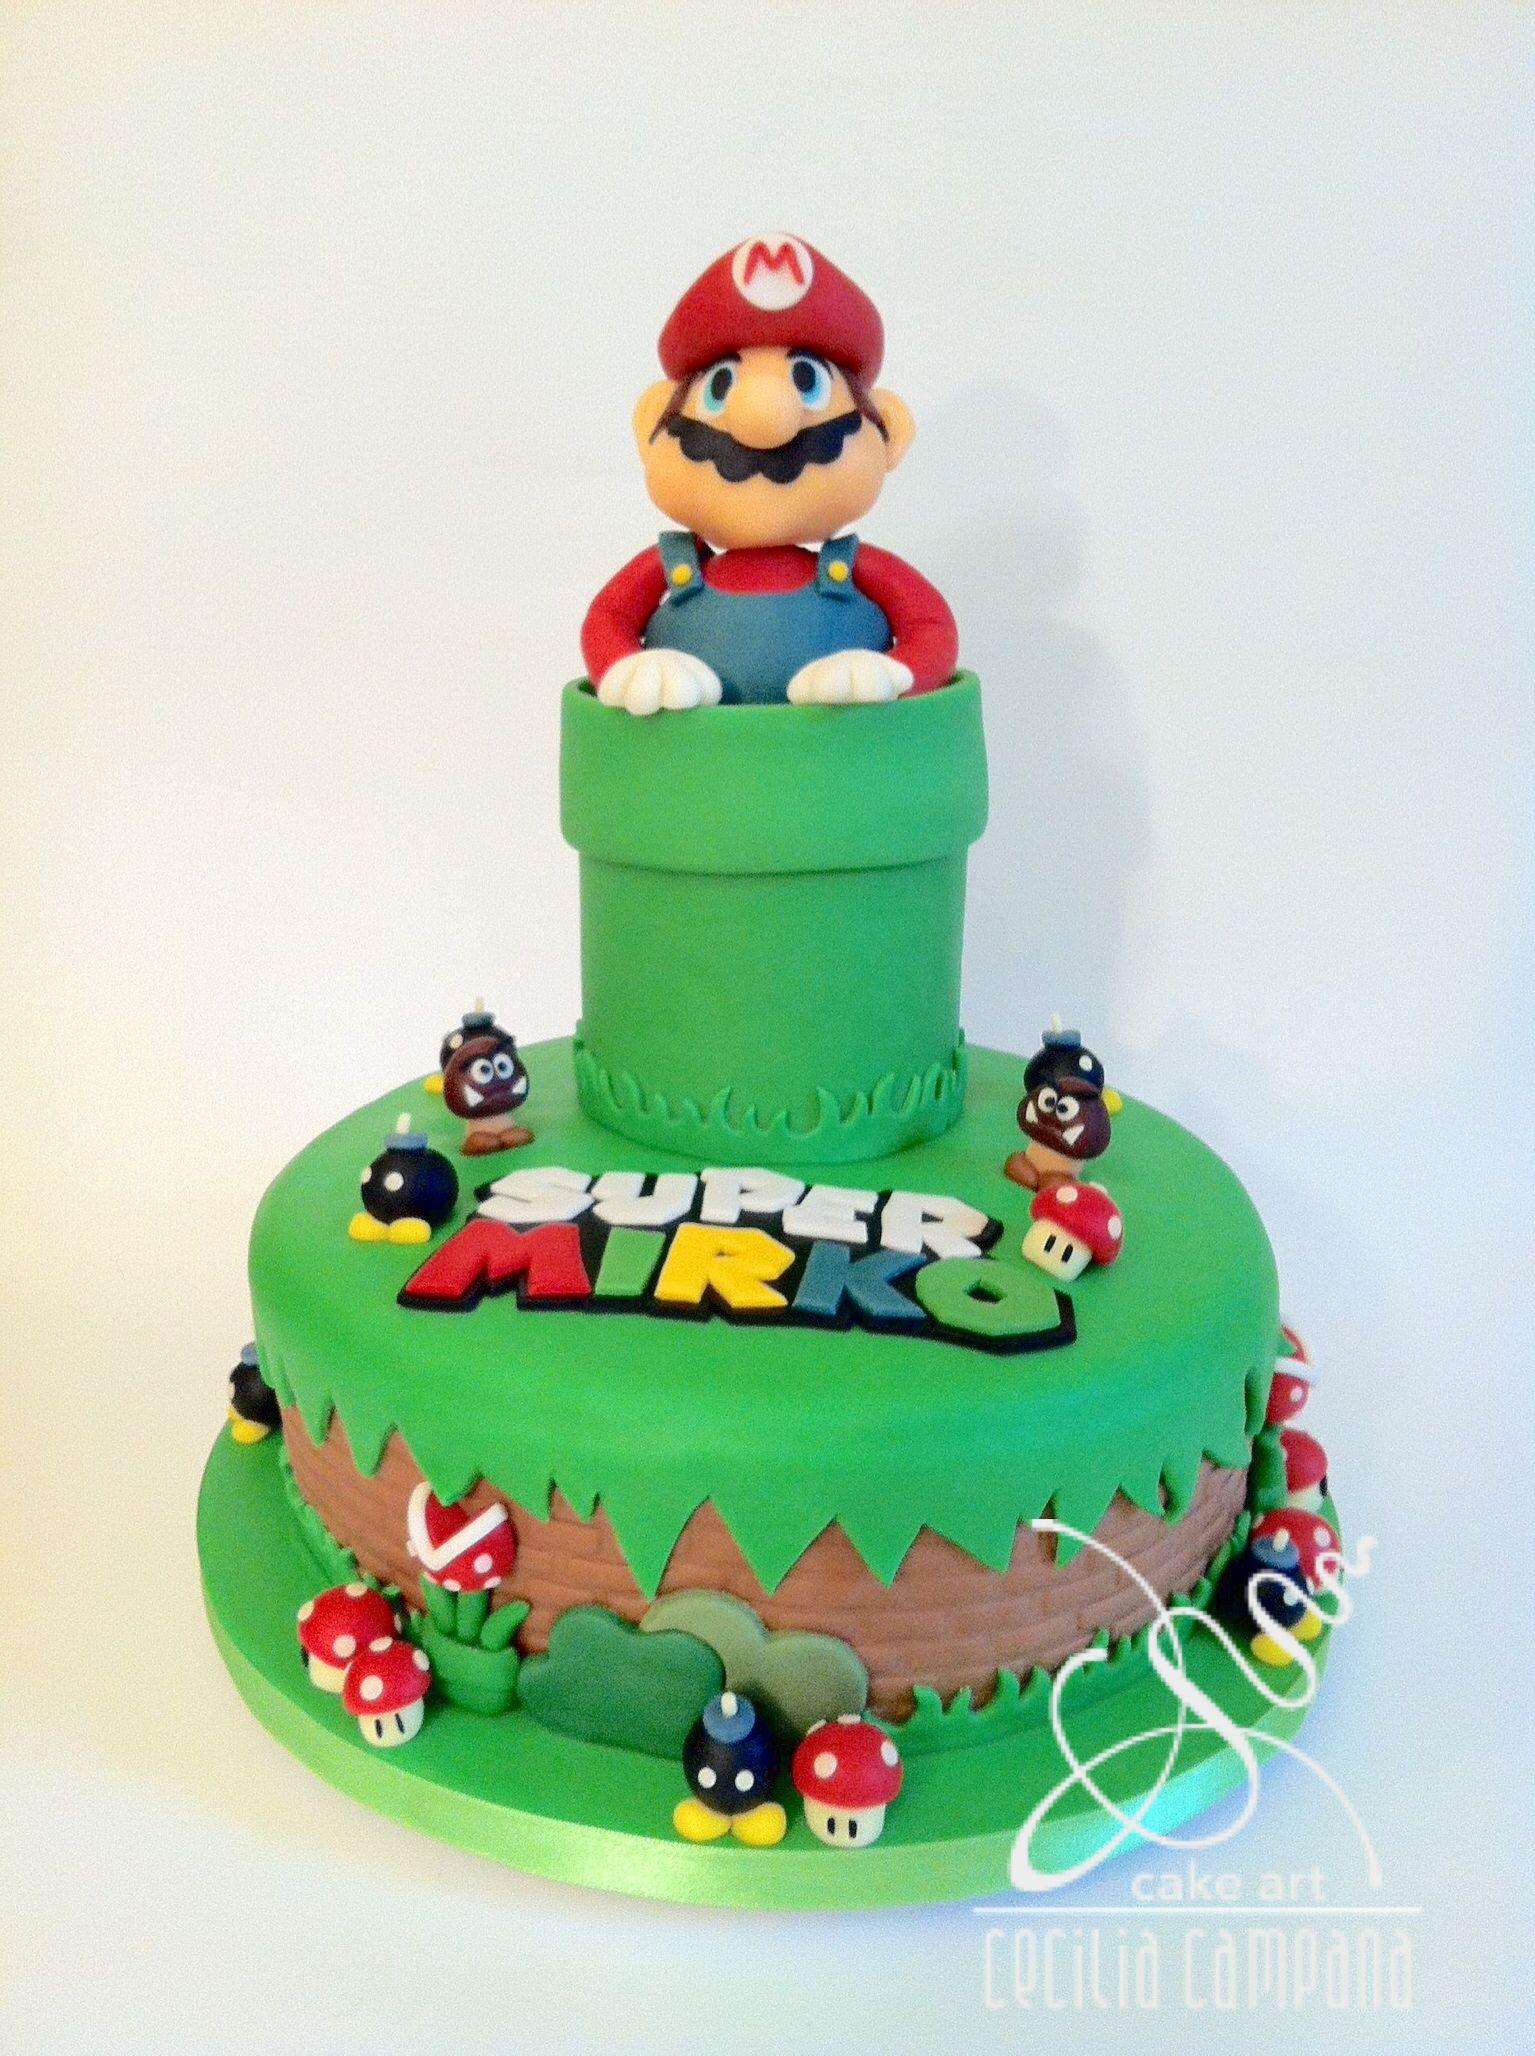 Super Mario Birthday Cake Fondant Sugarpaste Ceciliacampana